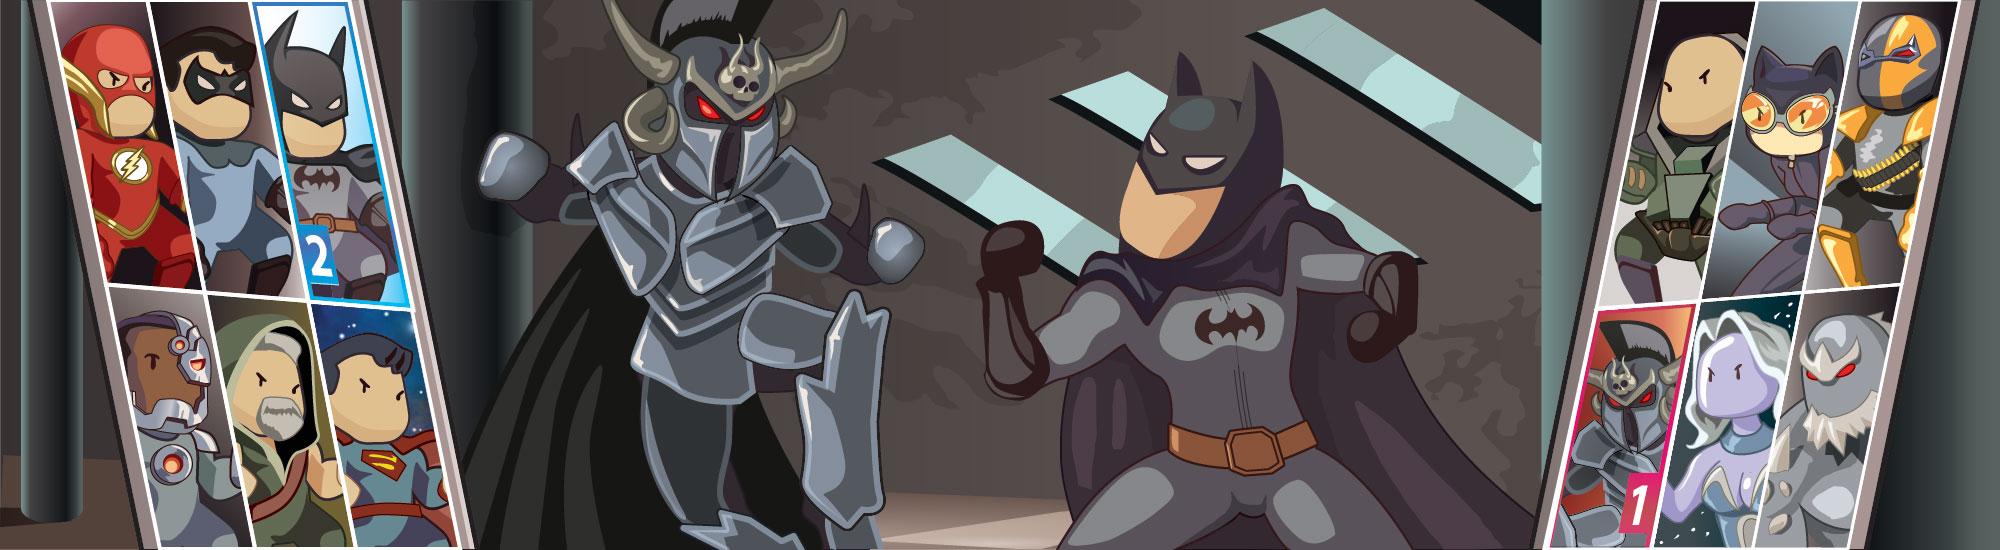 Ares vs Batman by Nekaris